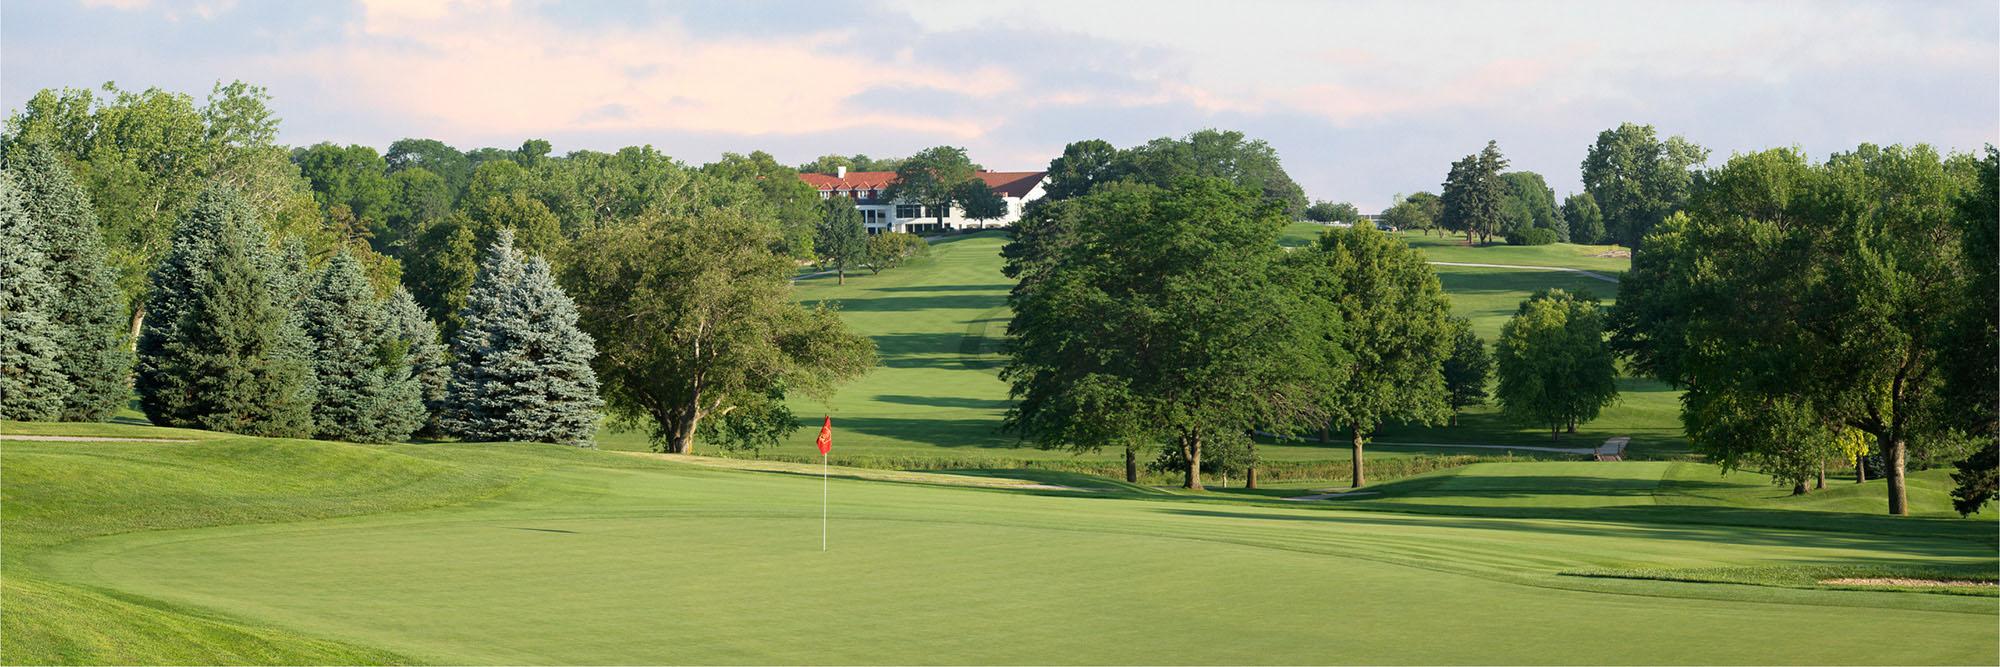 Golf Course Image - Happy Hollow Golf Club No. 17